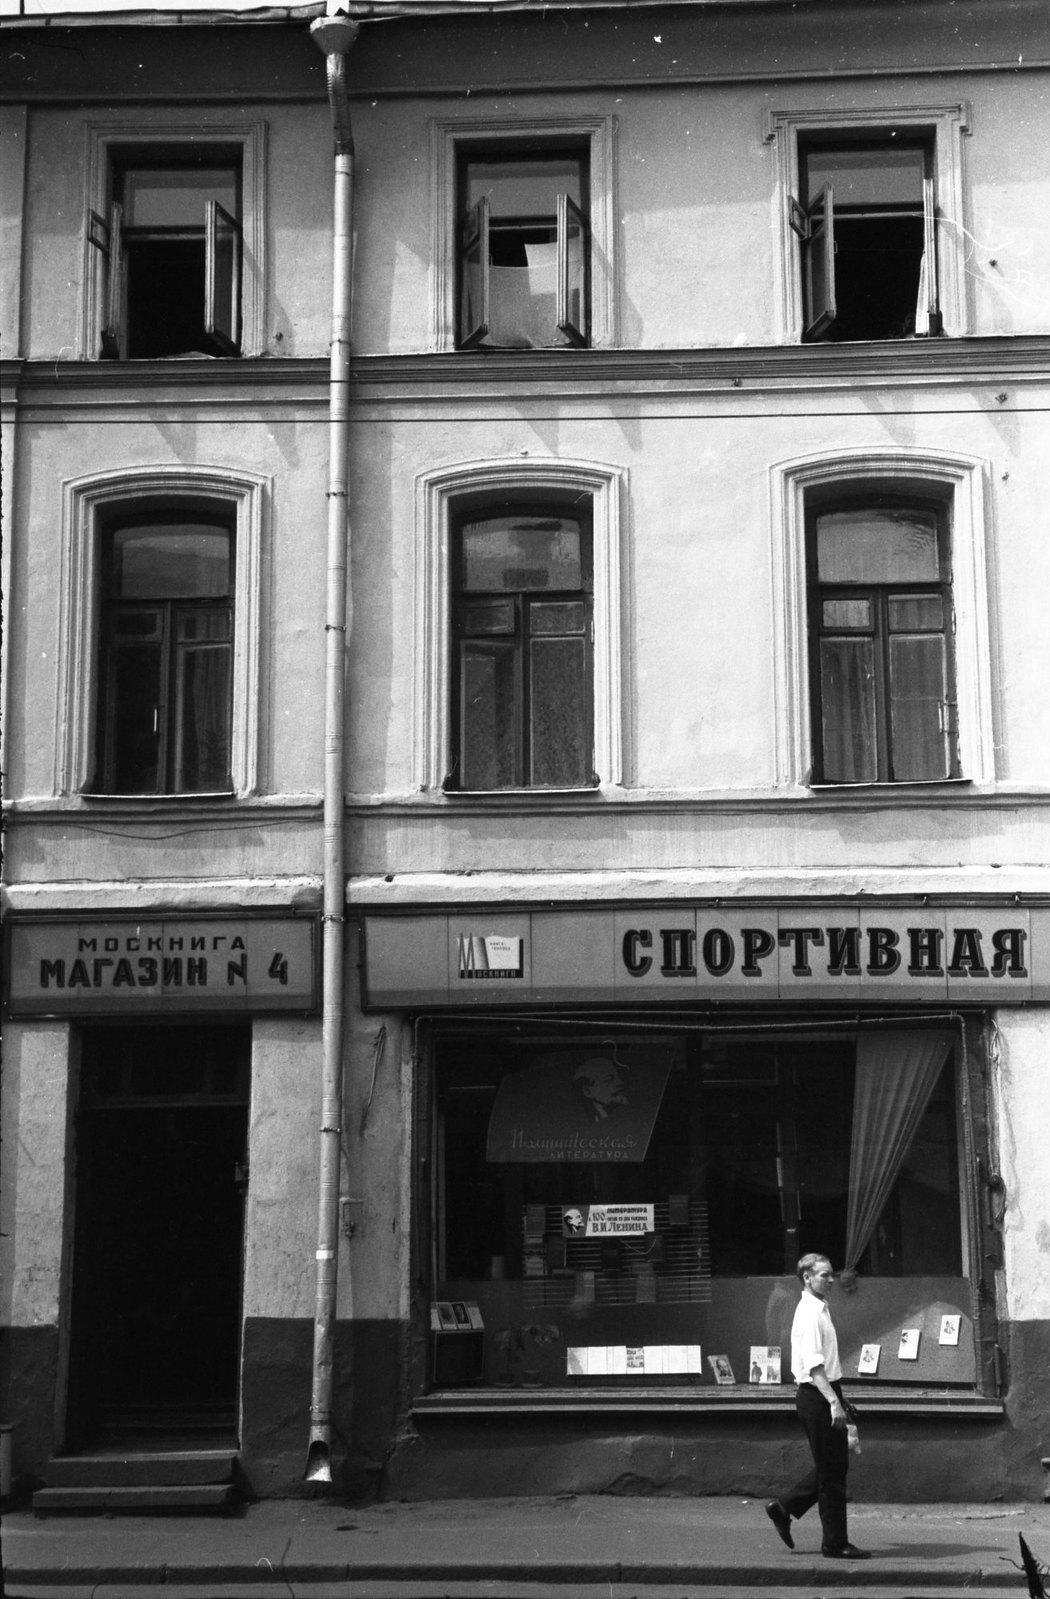 Улица Сретенка (1)